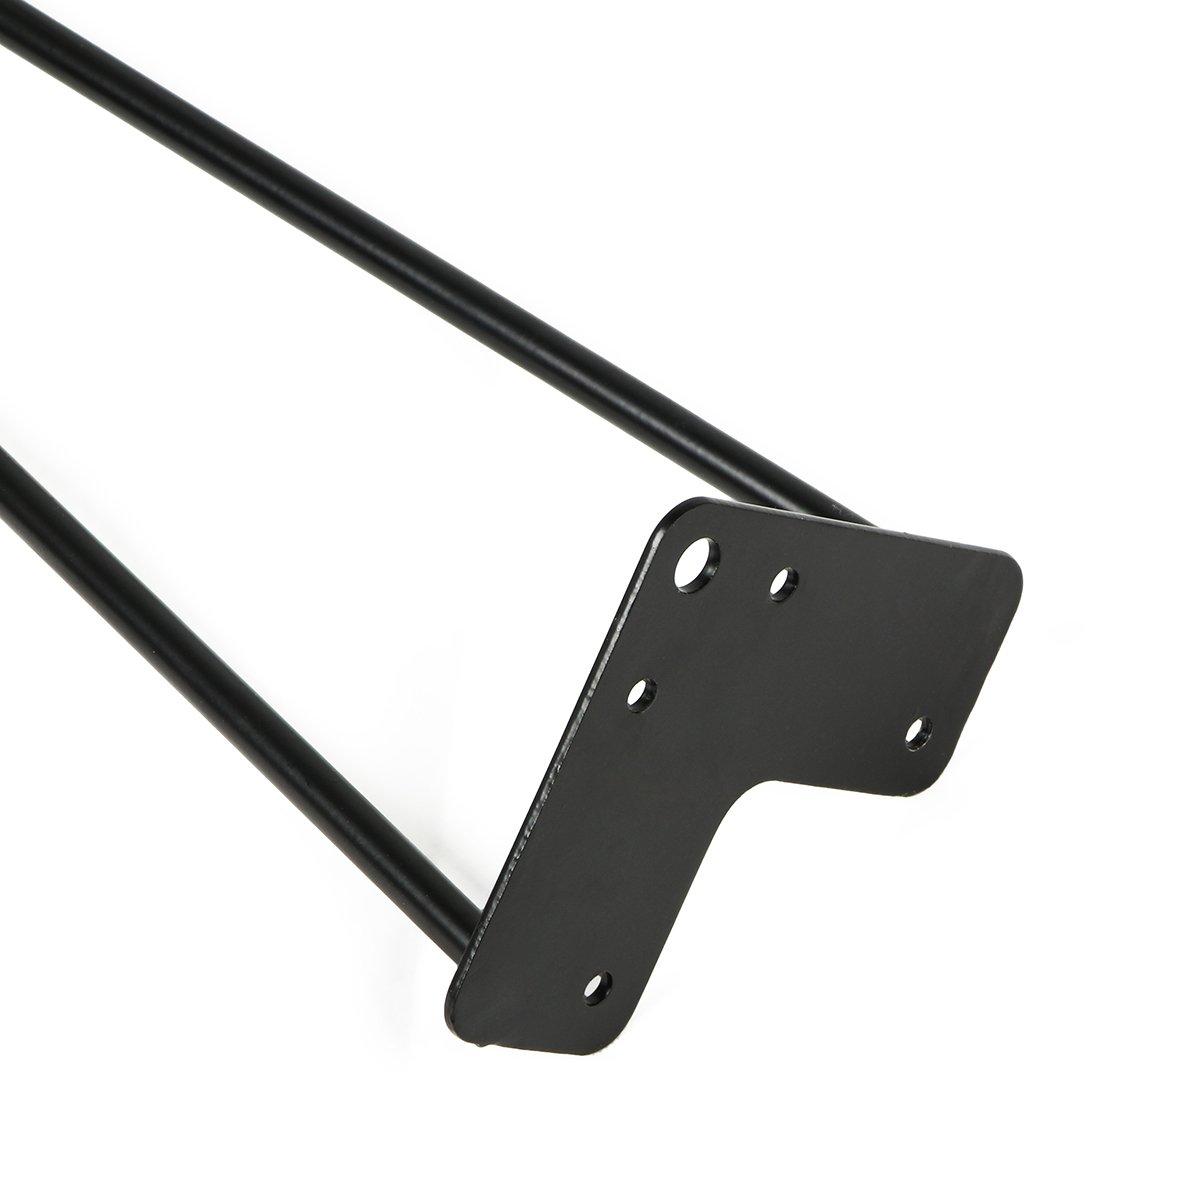 Metal Heavy Duty Sturdy Sharp Looking Modern Table Legs TE DEUM 16 Satin Black Hairpin Coffee Table Legs Set of 4